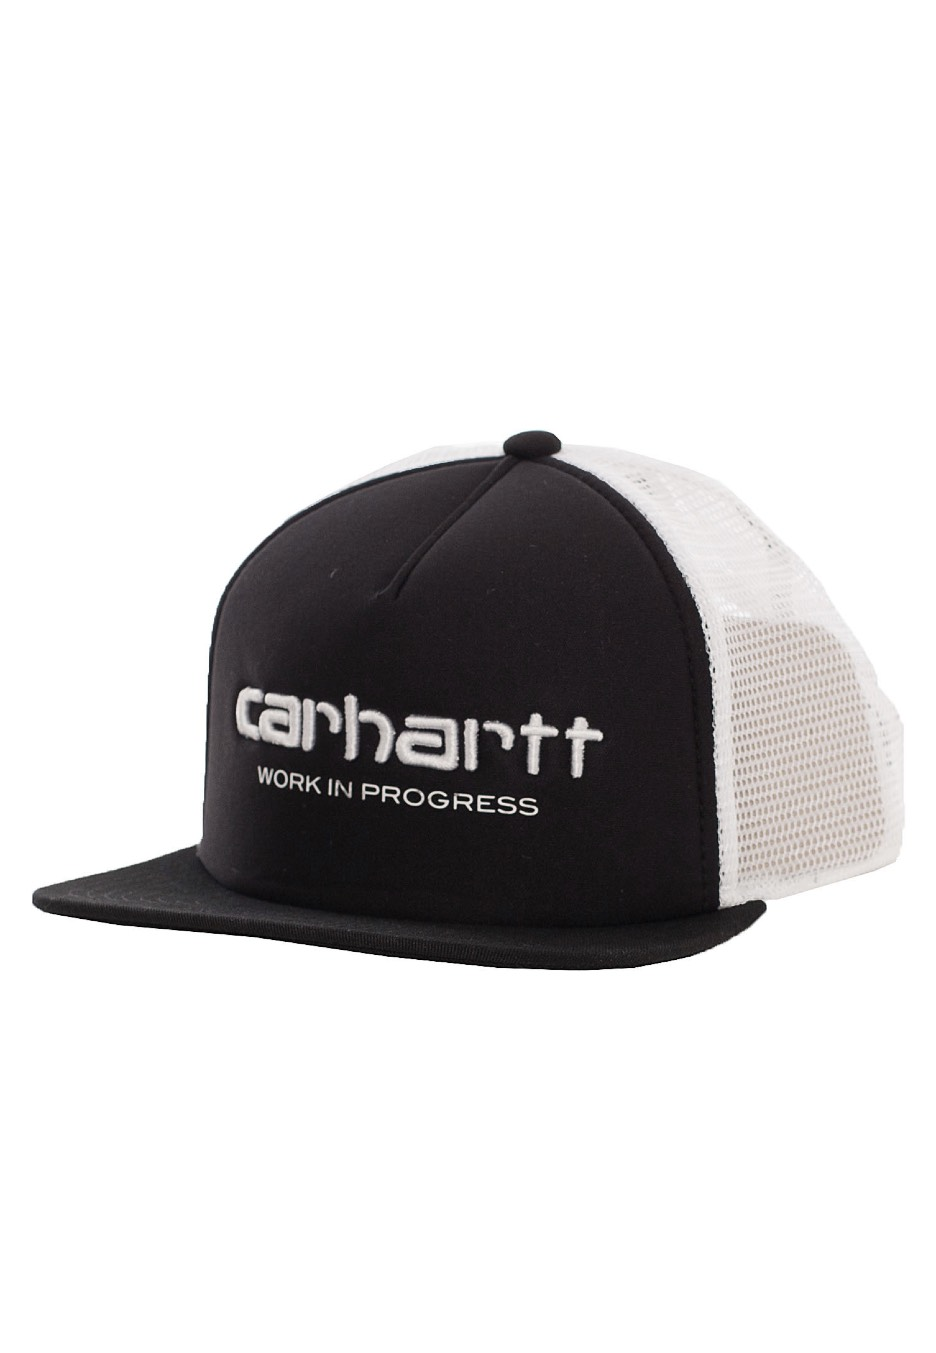 Carhartt WIP - Carhartt WIP Trucker Black/White...